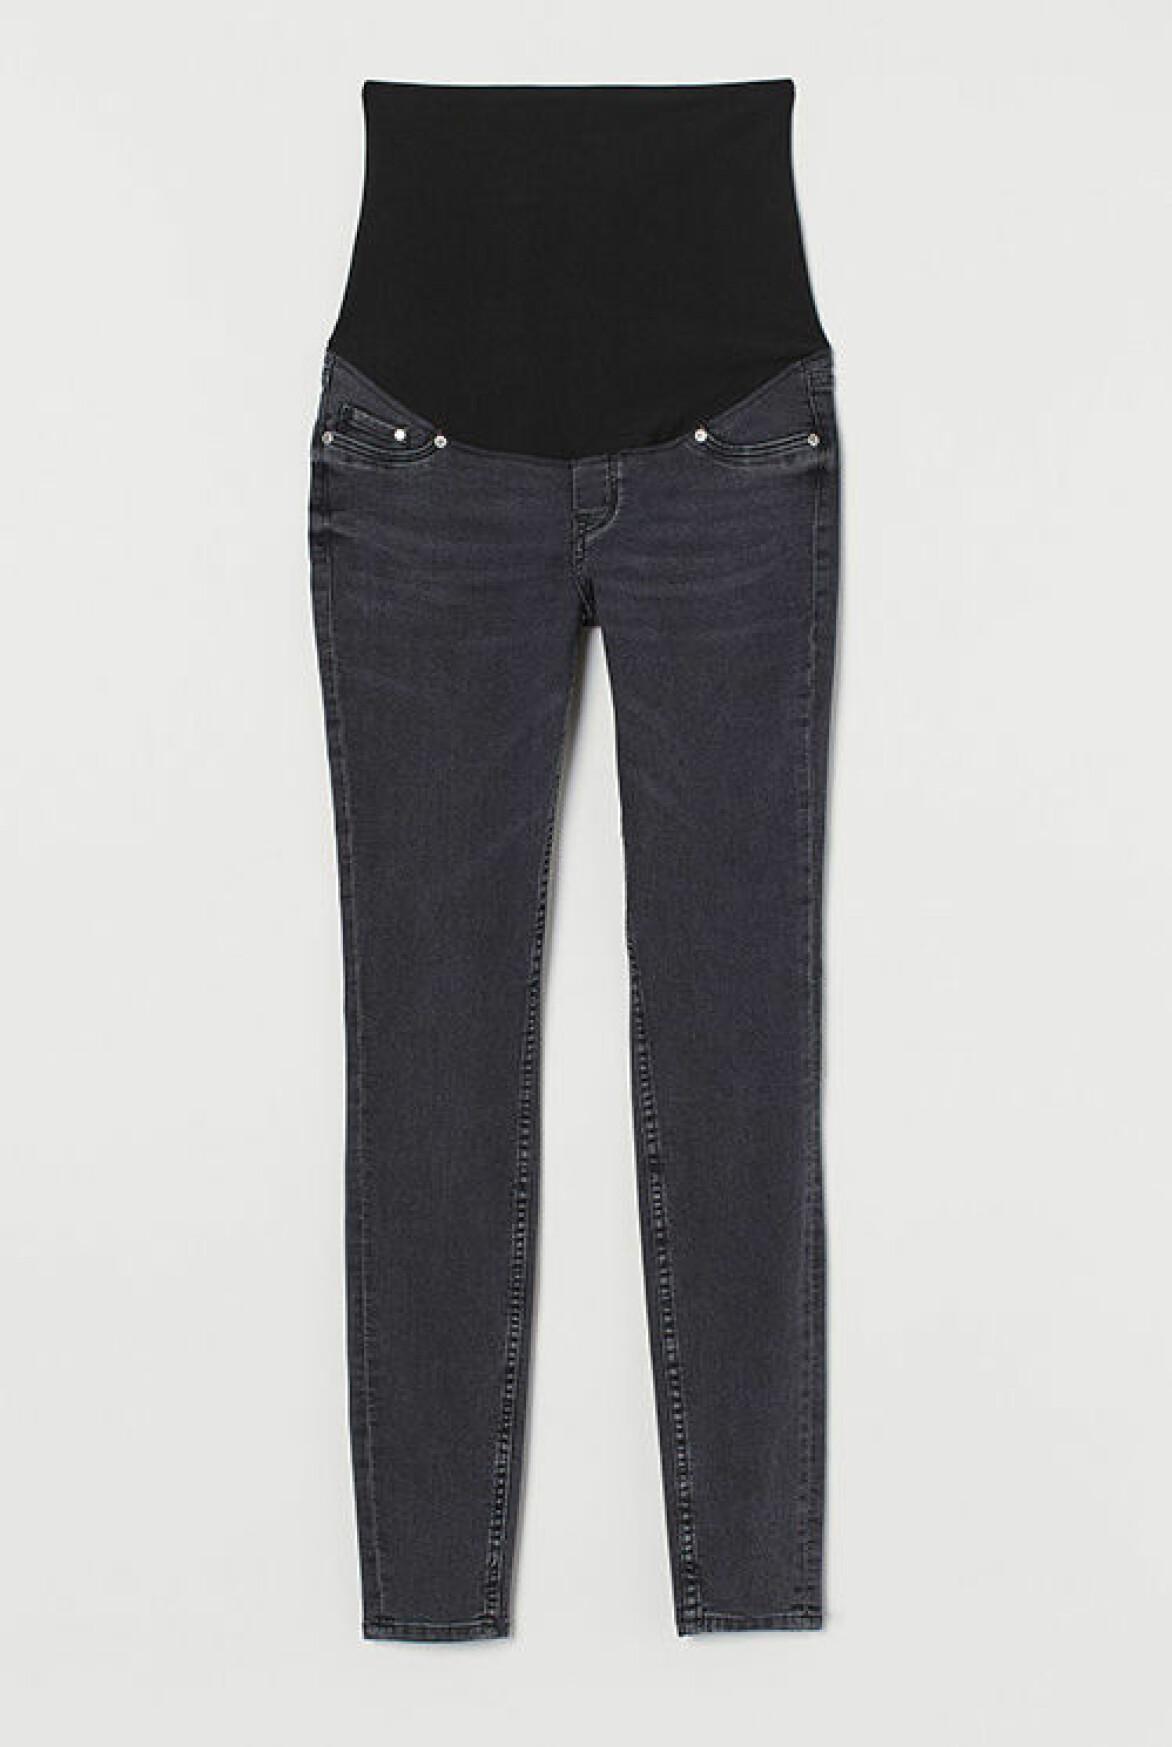 stretchiga-jeans-h&,